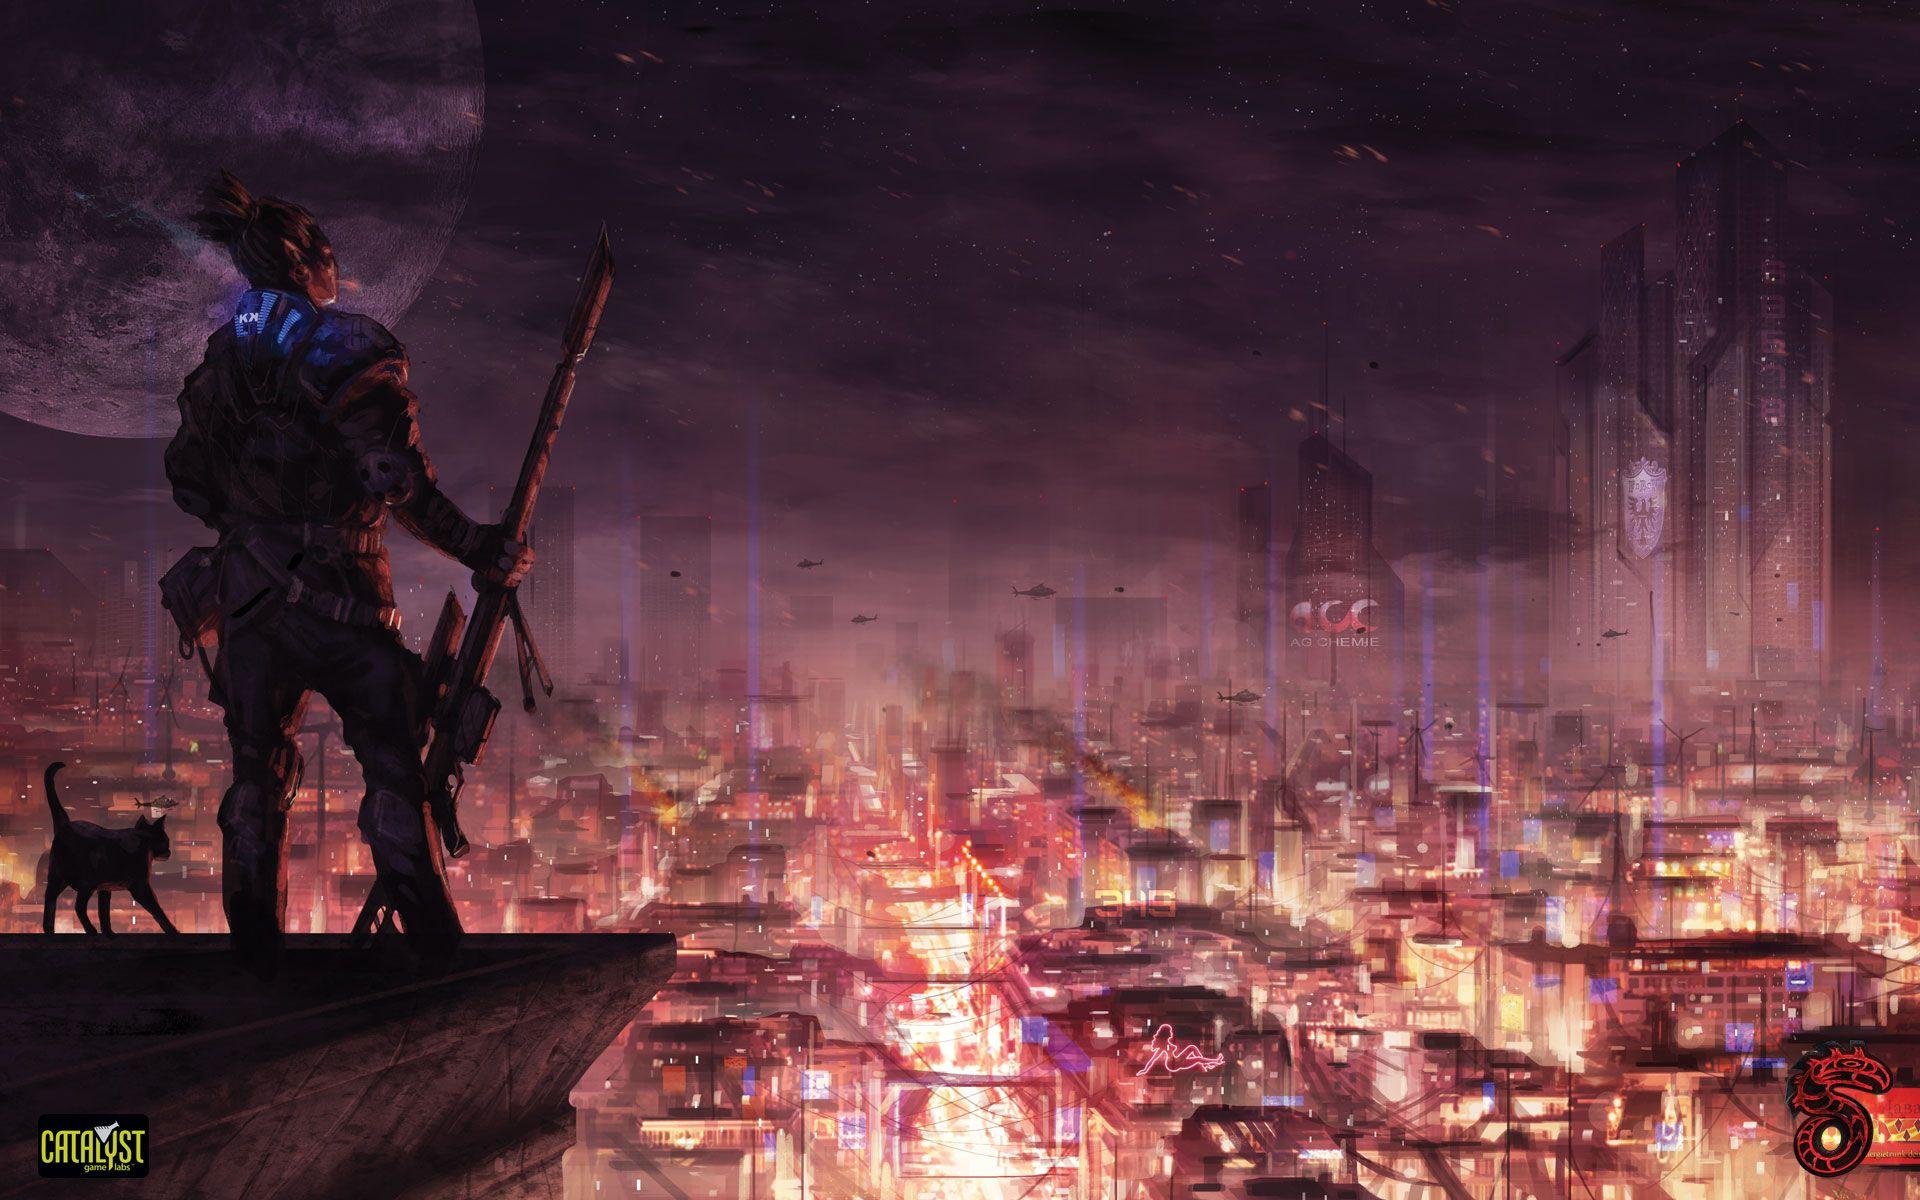 Wallpapers | Shadowrun 5 Overwatch | ART SCI-FI | Shadowrun